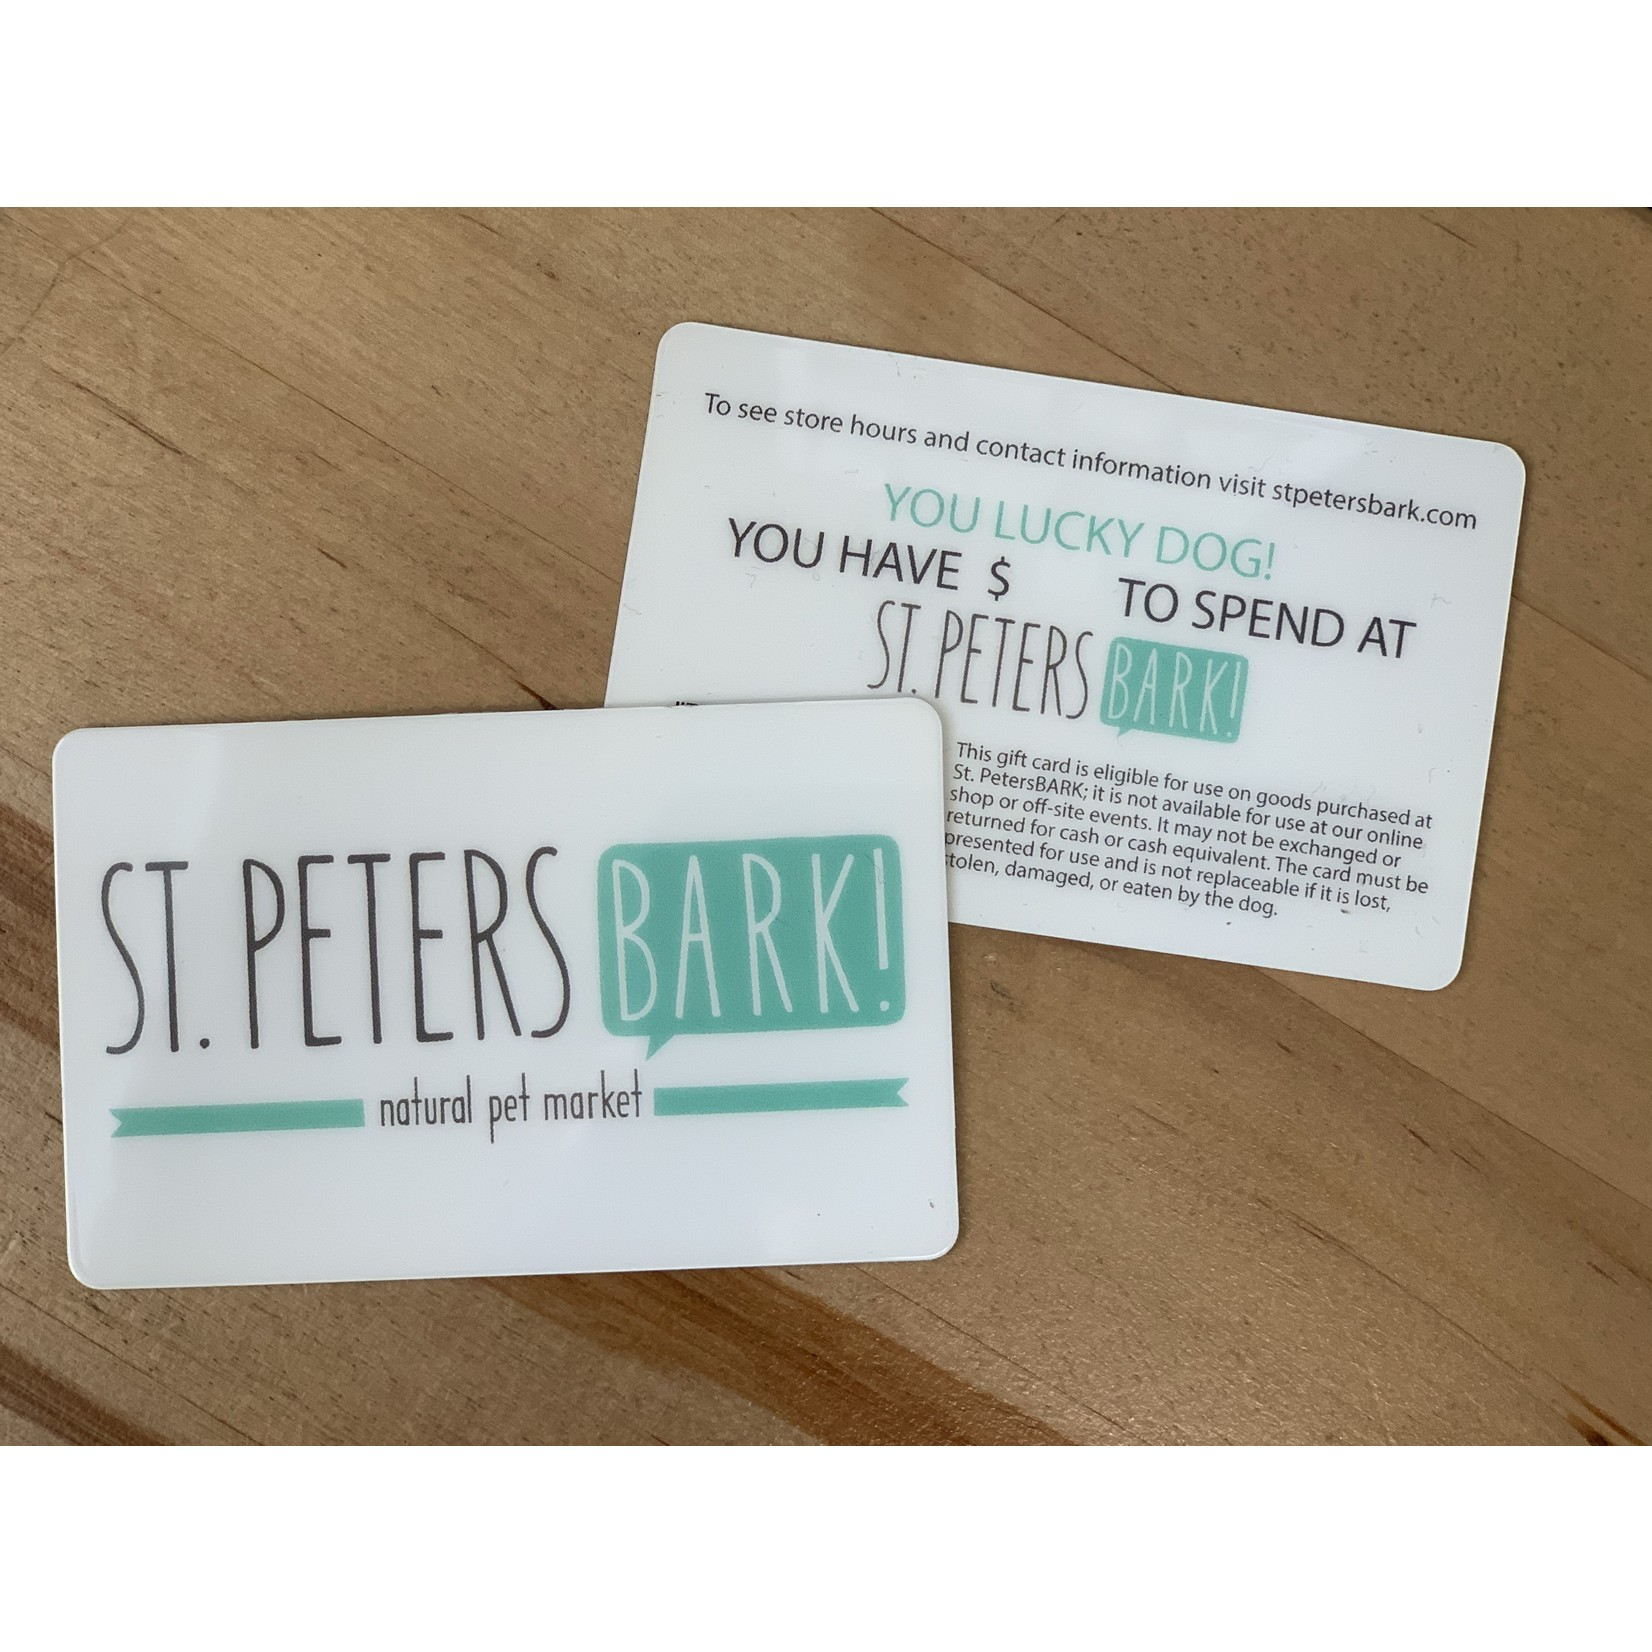 St PetersBARK! Gift Card